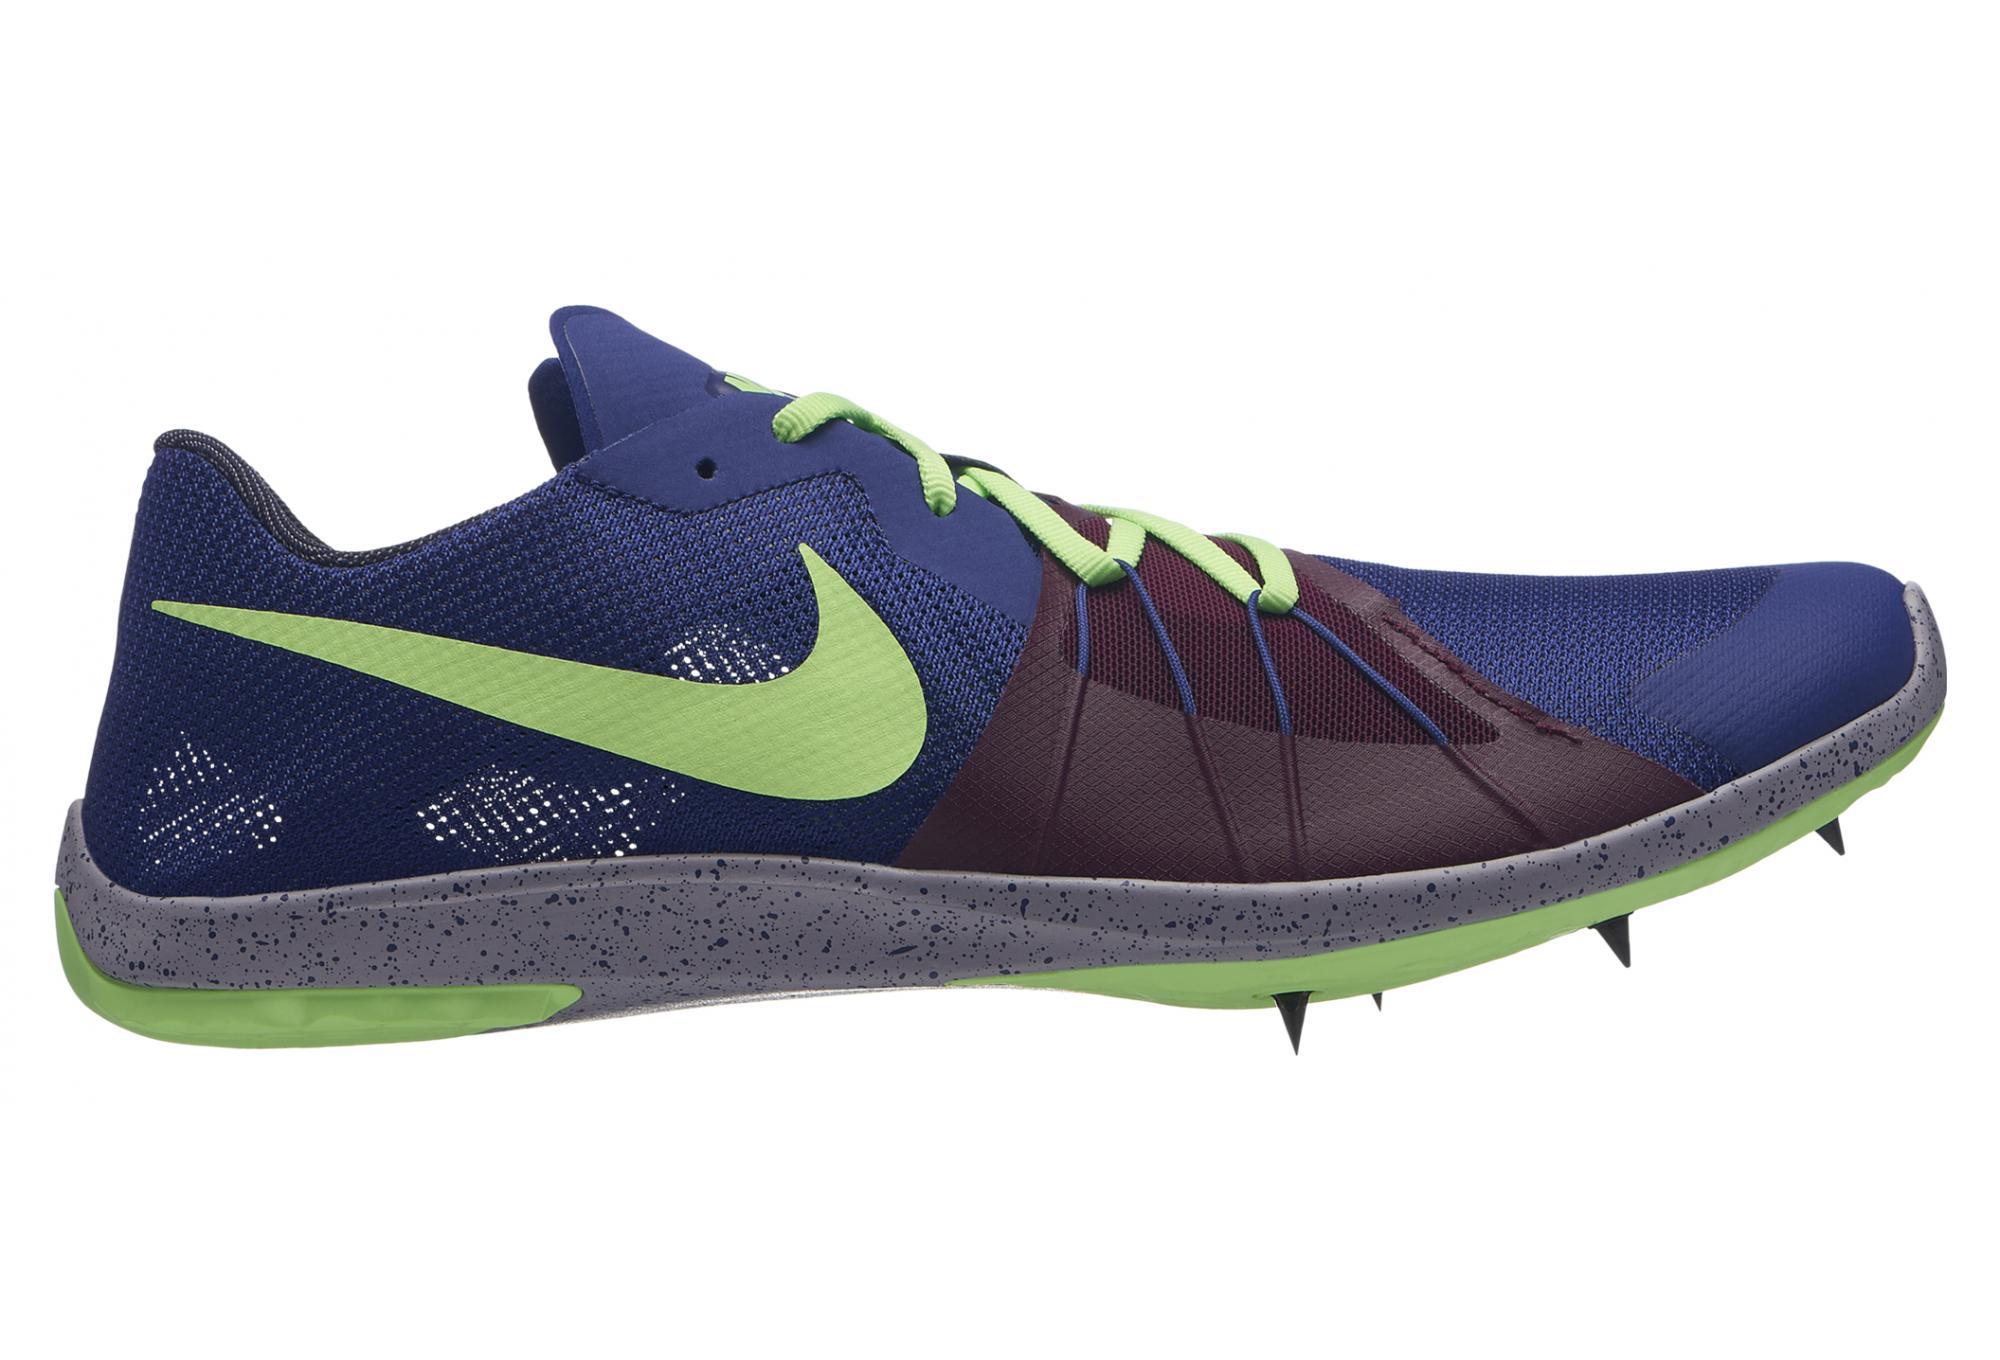 best sneakers efcad 57c25 Nike Zoom Forever XC 5 Shoes Blue Bordeaux Green   Alltricks.com